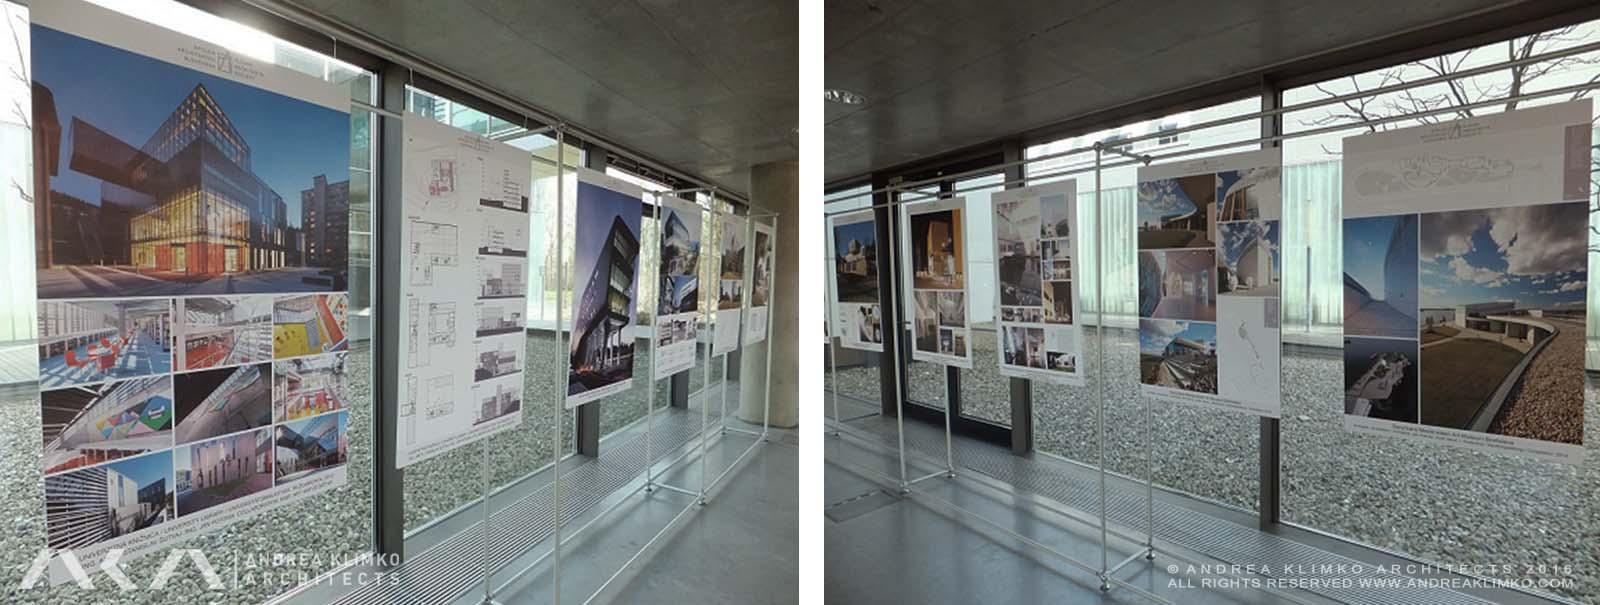 exhibition-in-wismar-university-germany_001